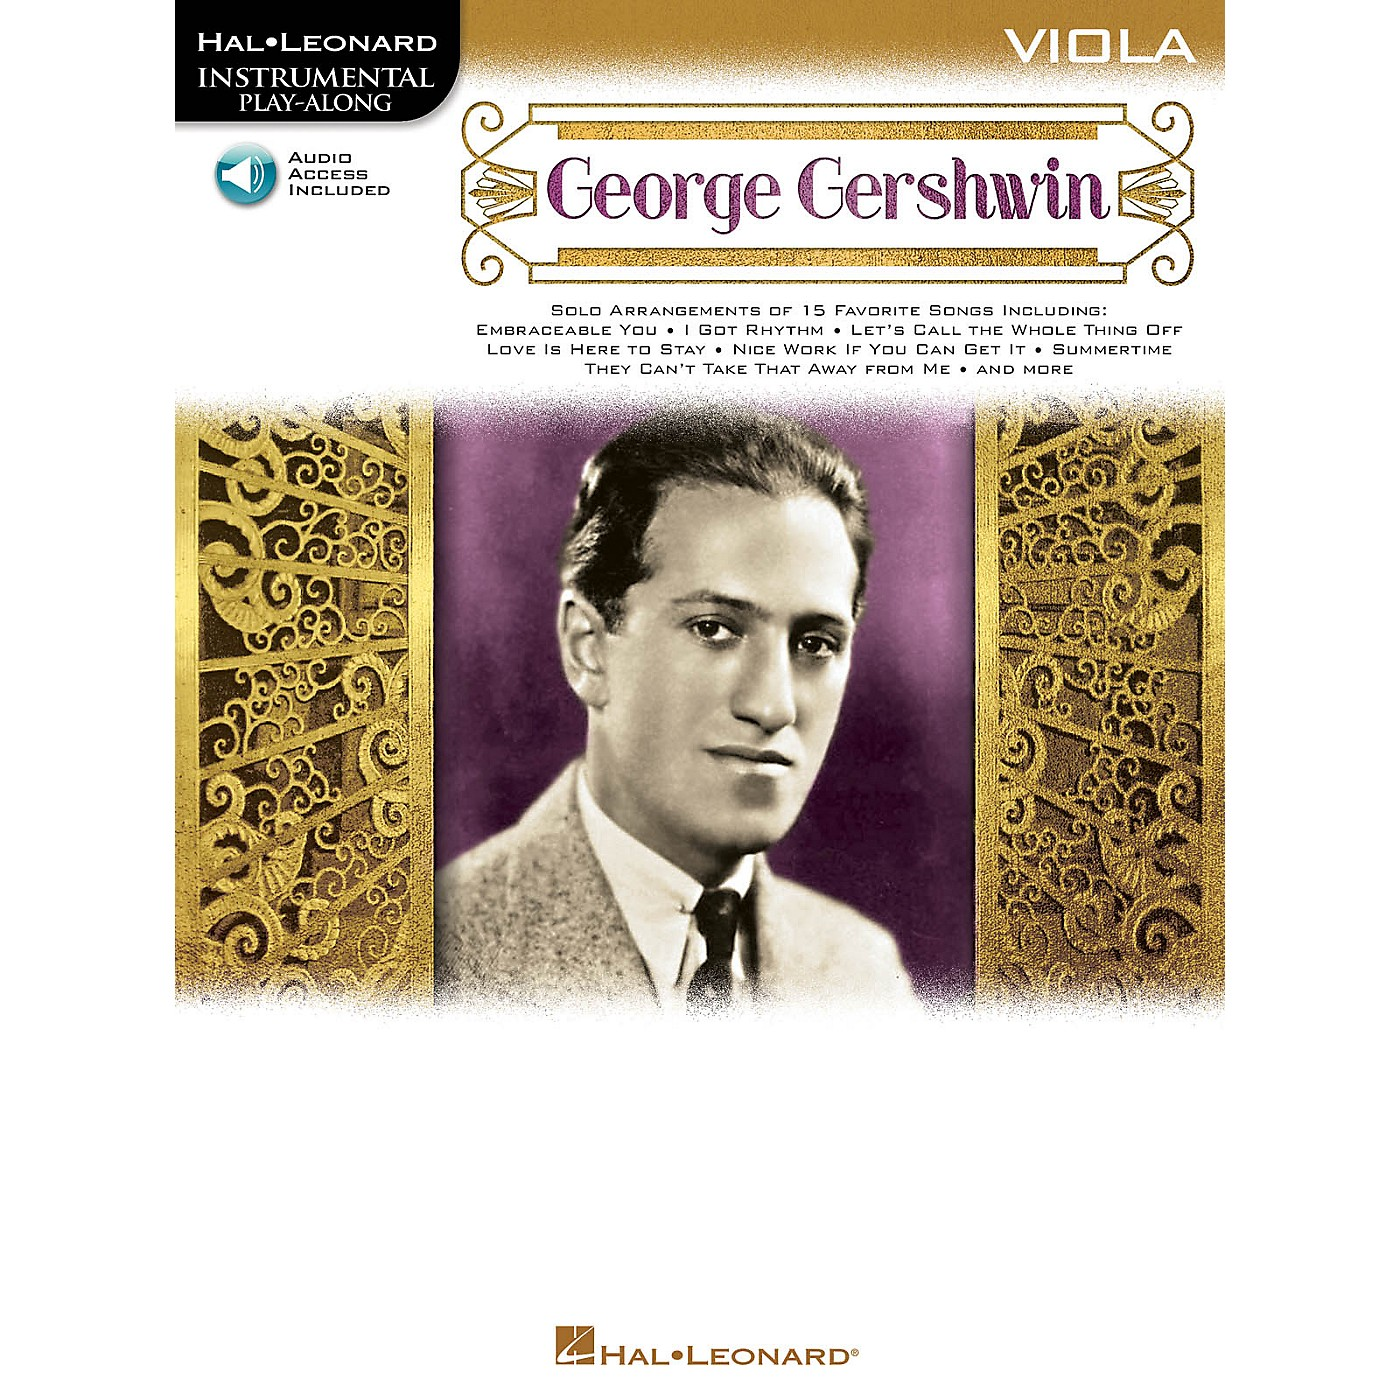 Hal Leonard George Gershwin (Instrumental Play-Along for Viola) Instrumental Play-Along Series Softcover Audio Online thumbnail